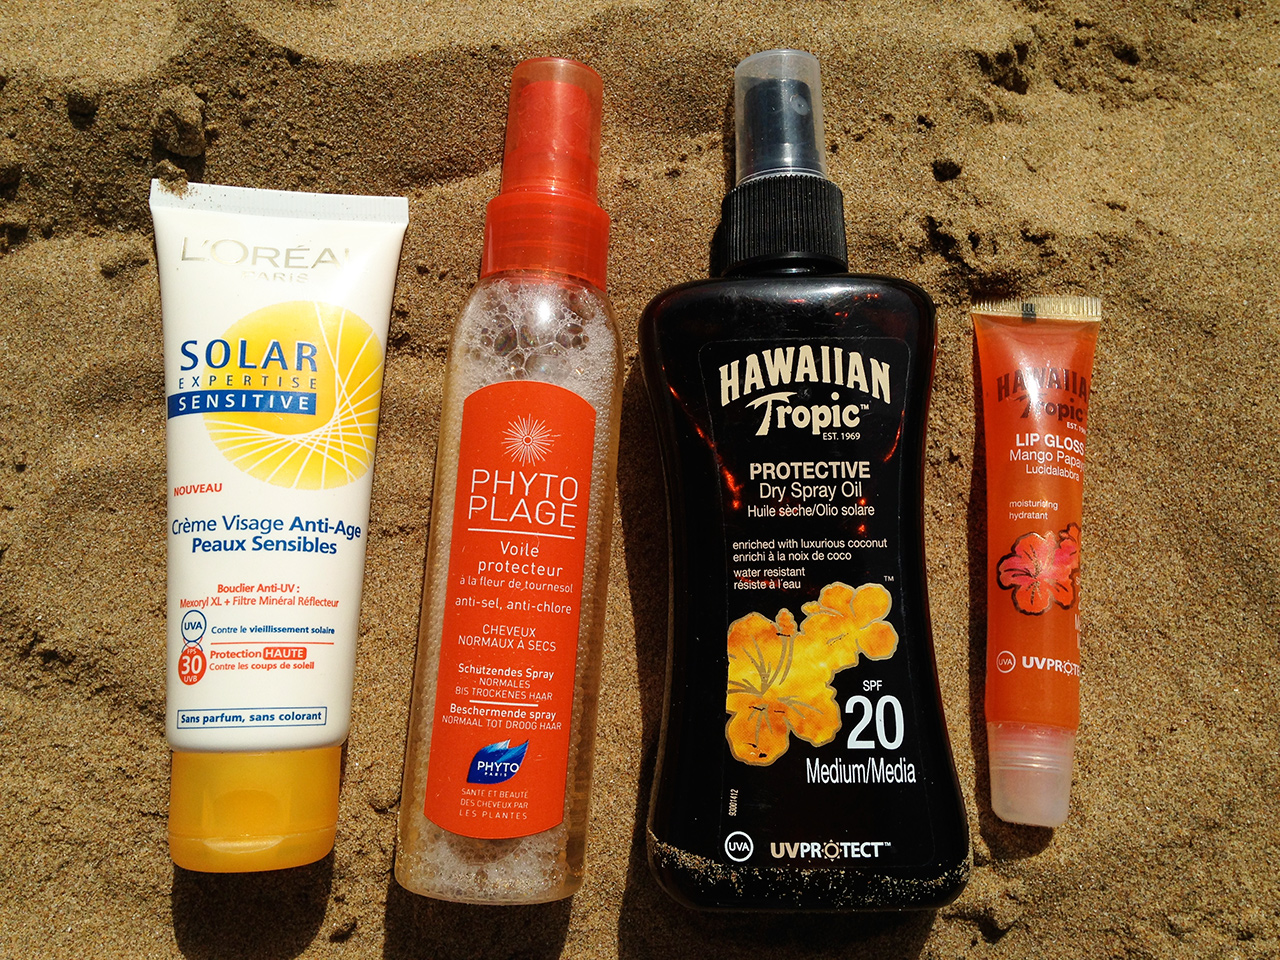 Vanity soleil L'Oréal Hawaiian Tropic Phyto